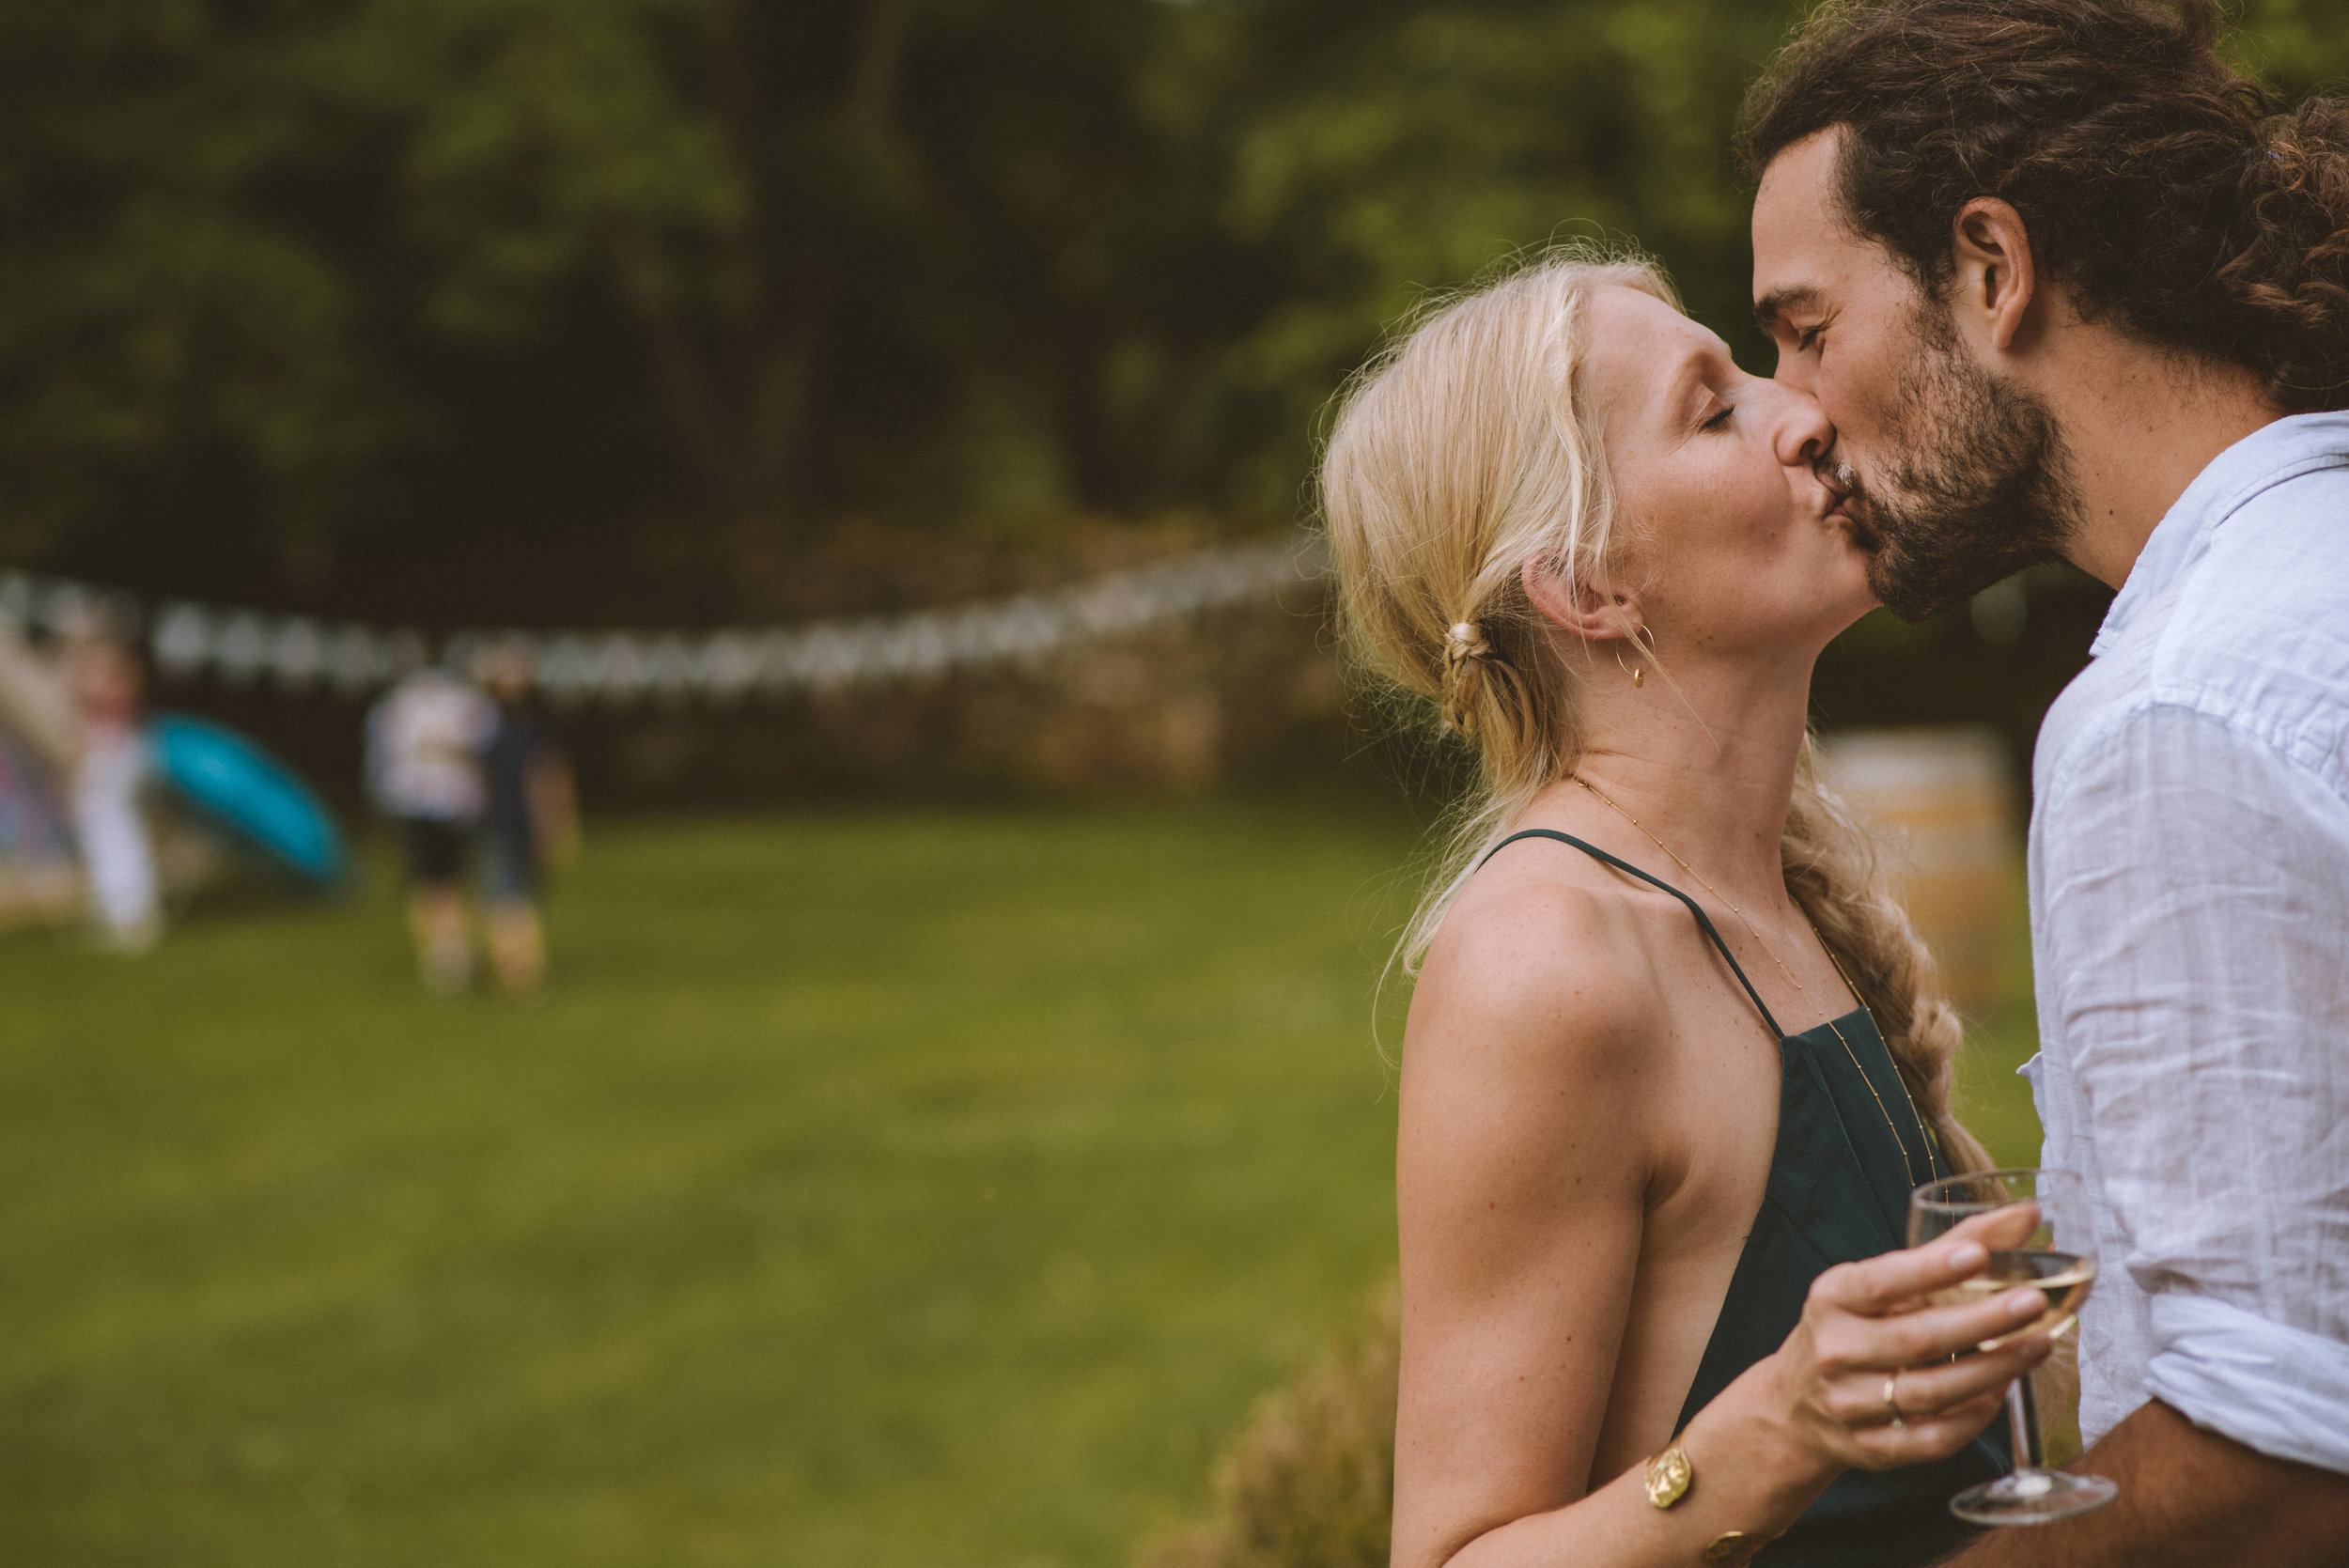 wedding-photographer-dordogne-mark-shaw-35.jpg